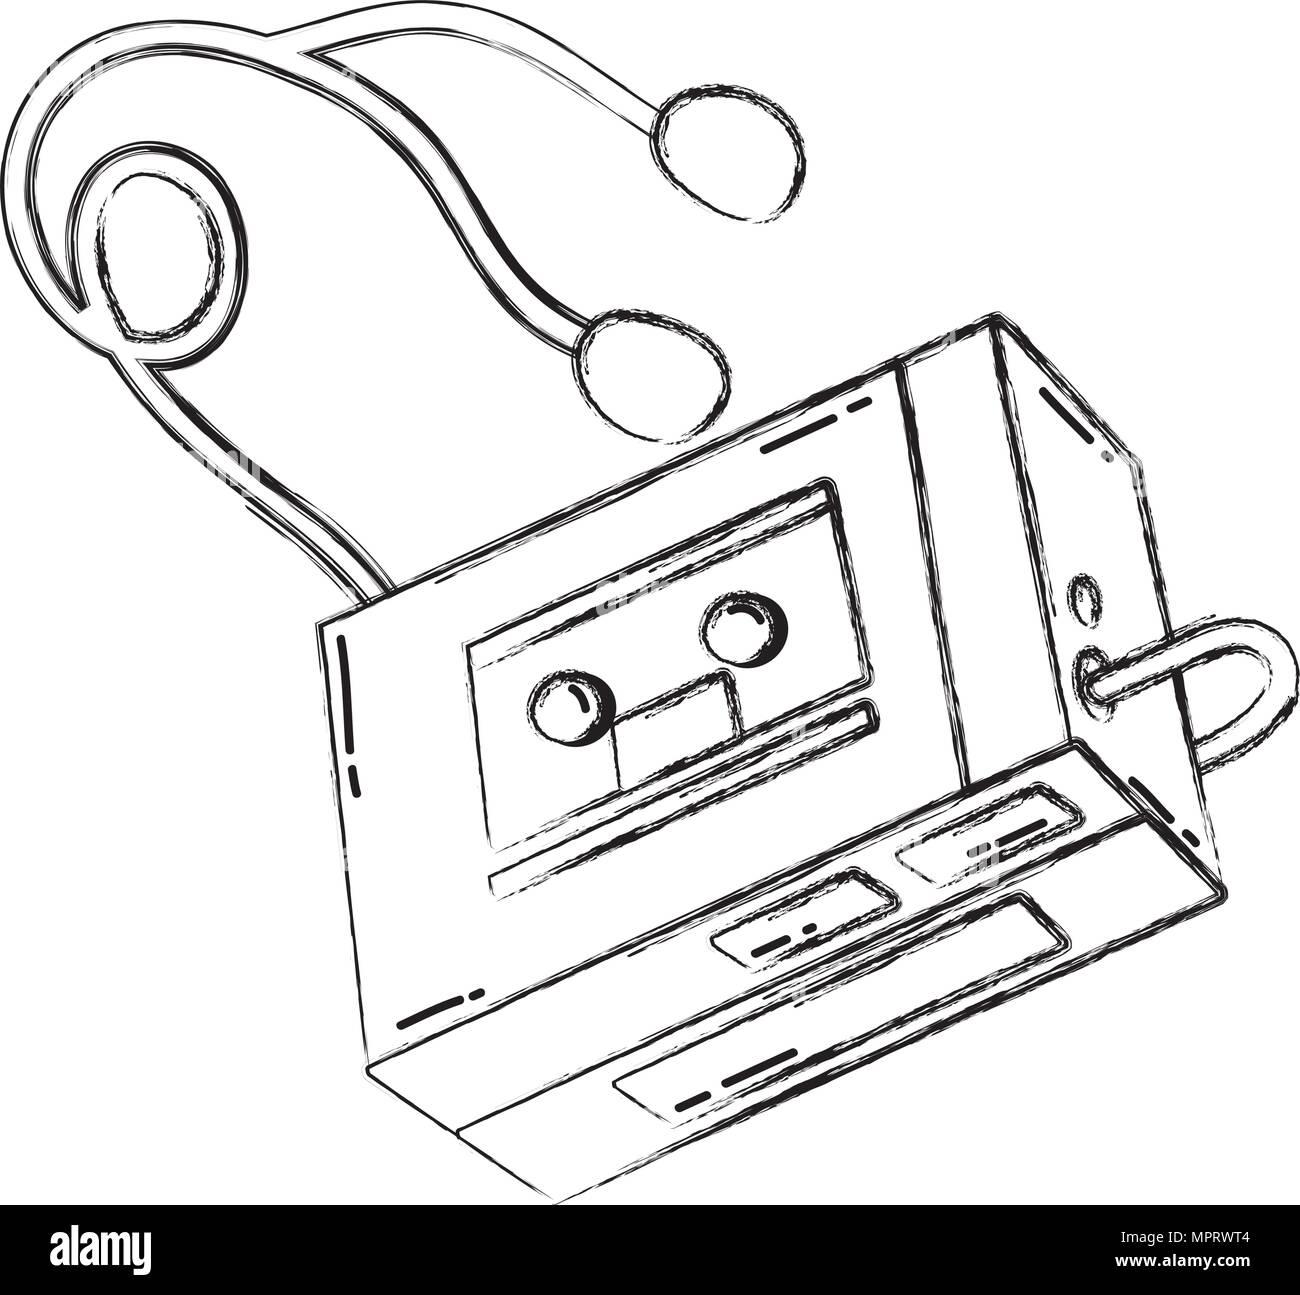 grunge retro walman stereo music player - Stock Image